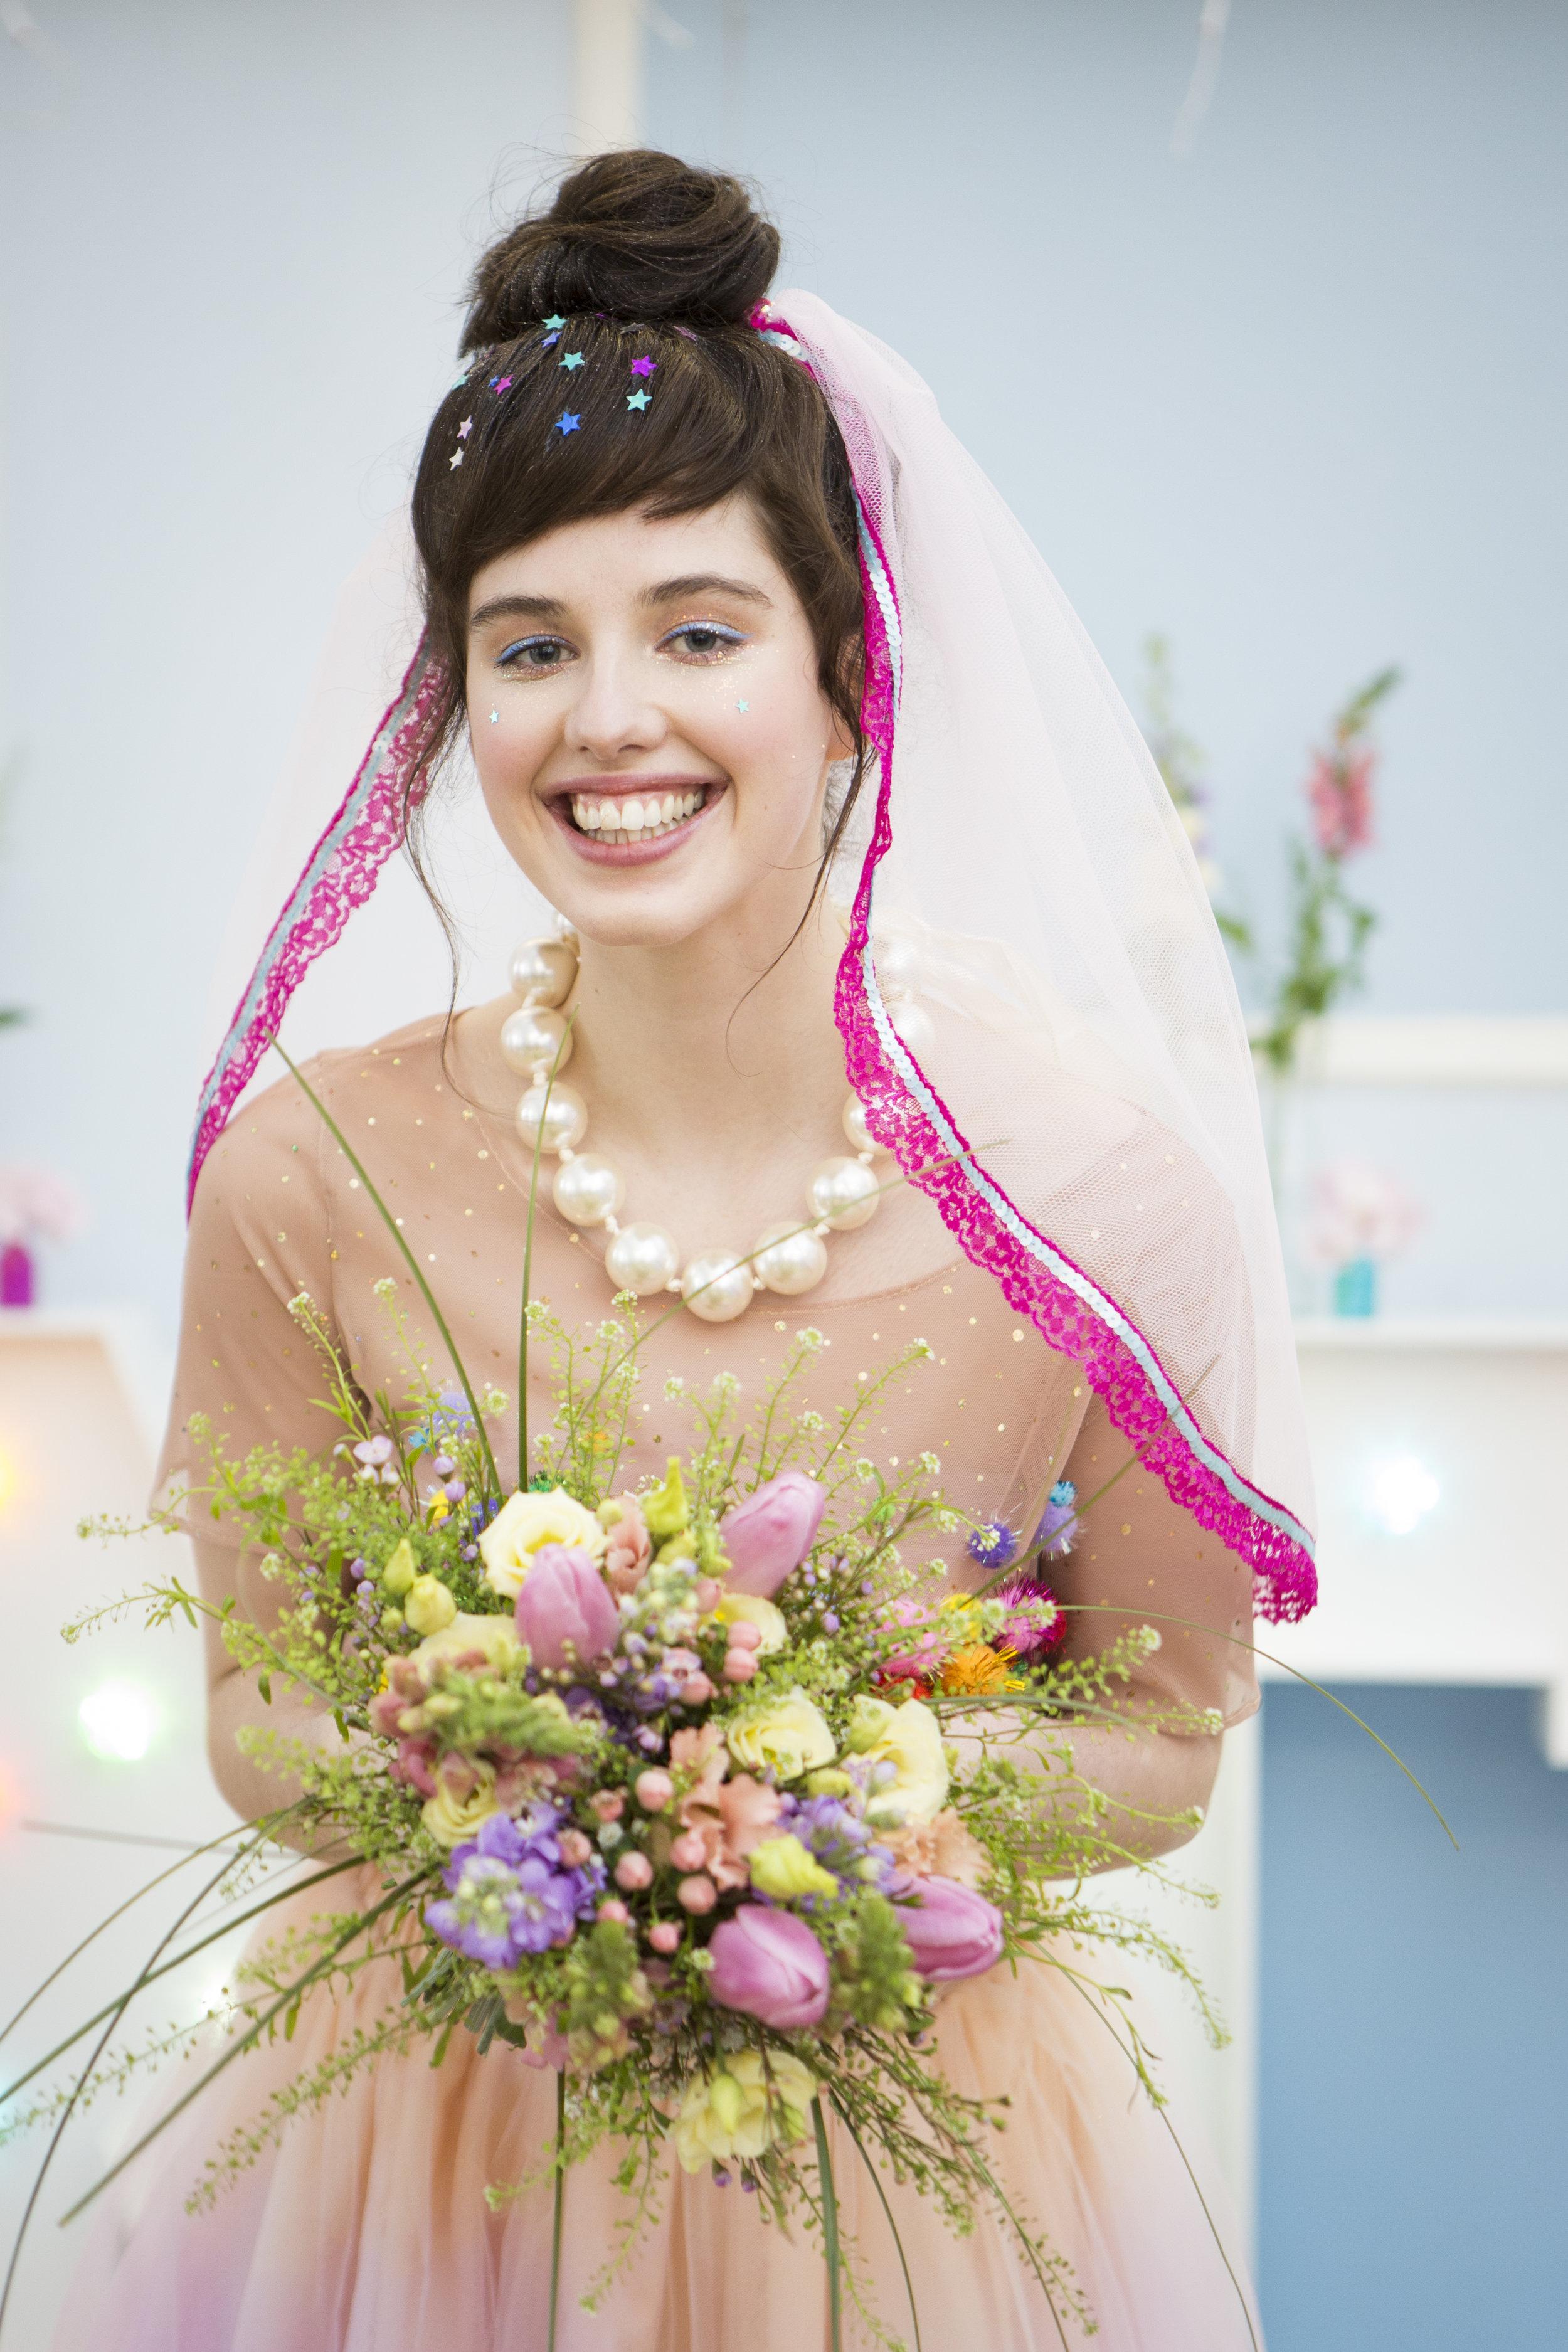 Prom Night Wedding Shoot Meadham Kirchhoff Carrie 00111.jpg